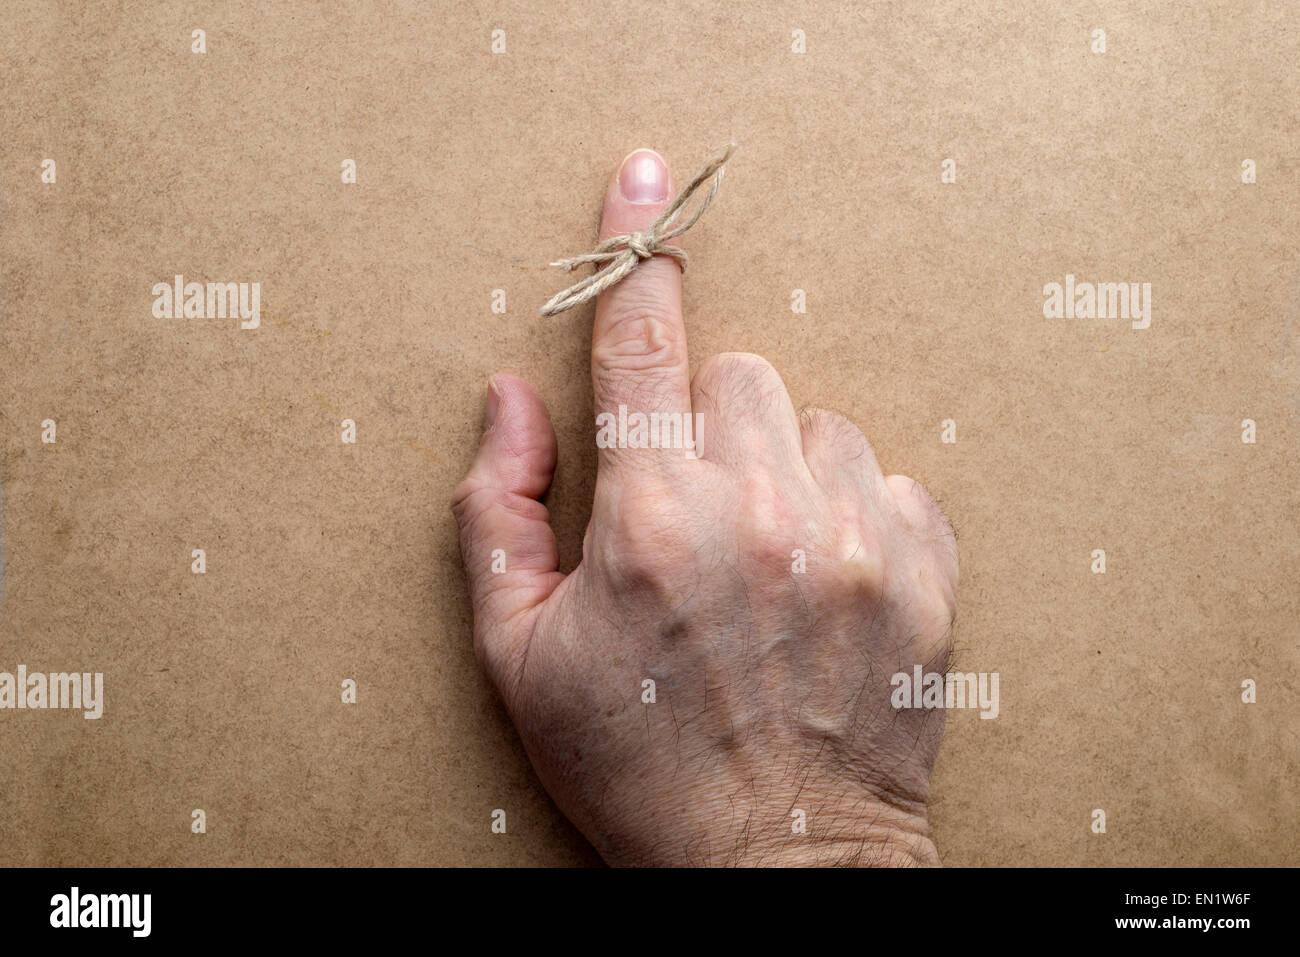 String on index finger of an elderly man. Wooden background - Stock Image